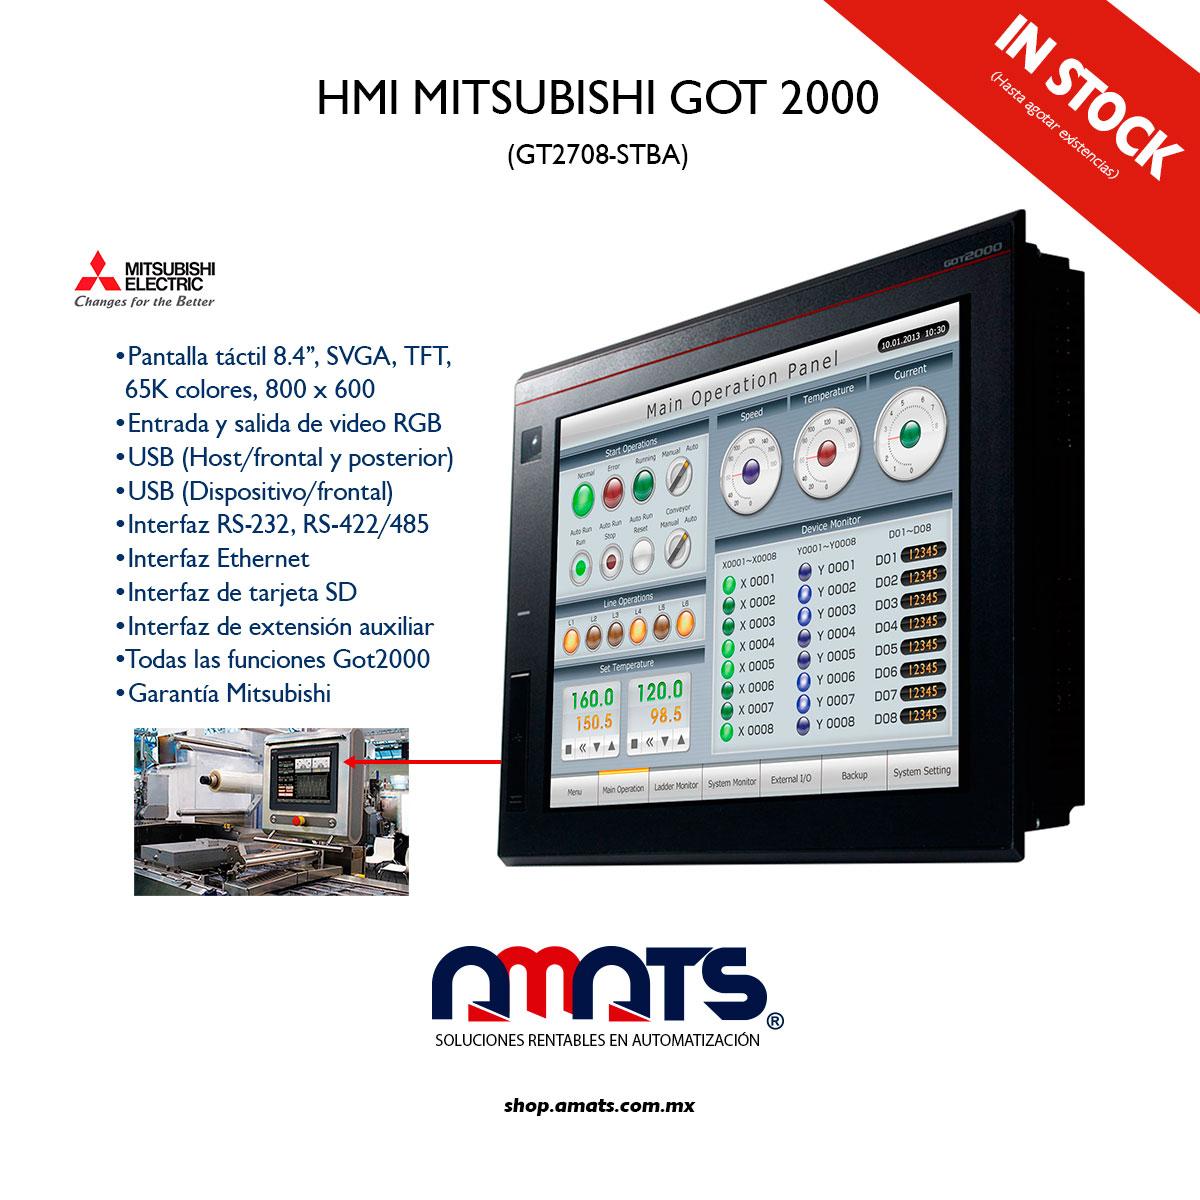 Tenemos 4 pantallas de la serie GOT2000 disponibles, modelo GT2708-STBA de Mitsubishi, las mejores HMI´s del mercado #amatselectric #amatsshop #mitsubishielectric #humanmachineinterface #automatización #GOT2000 #touchscreen #hmi #pantallamitsubishi